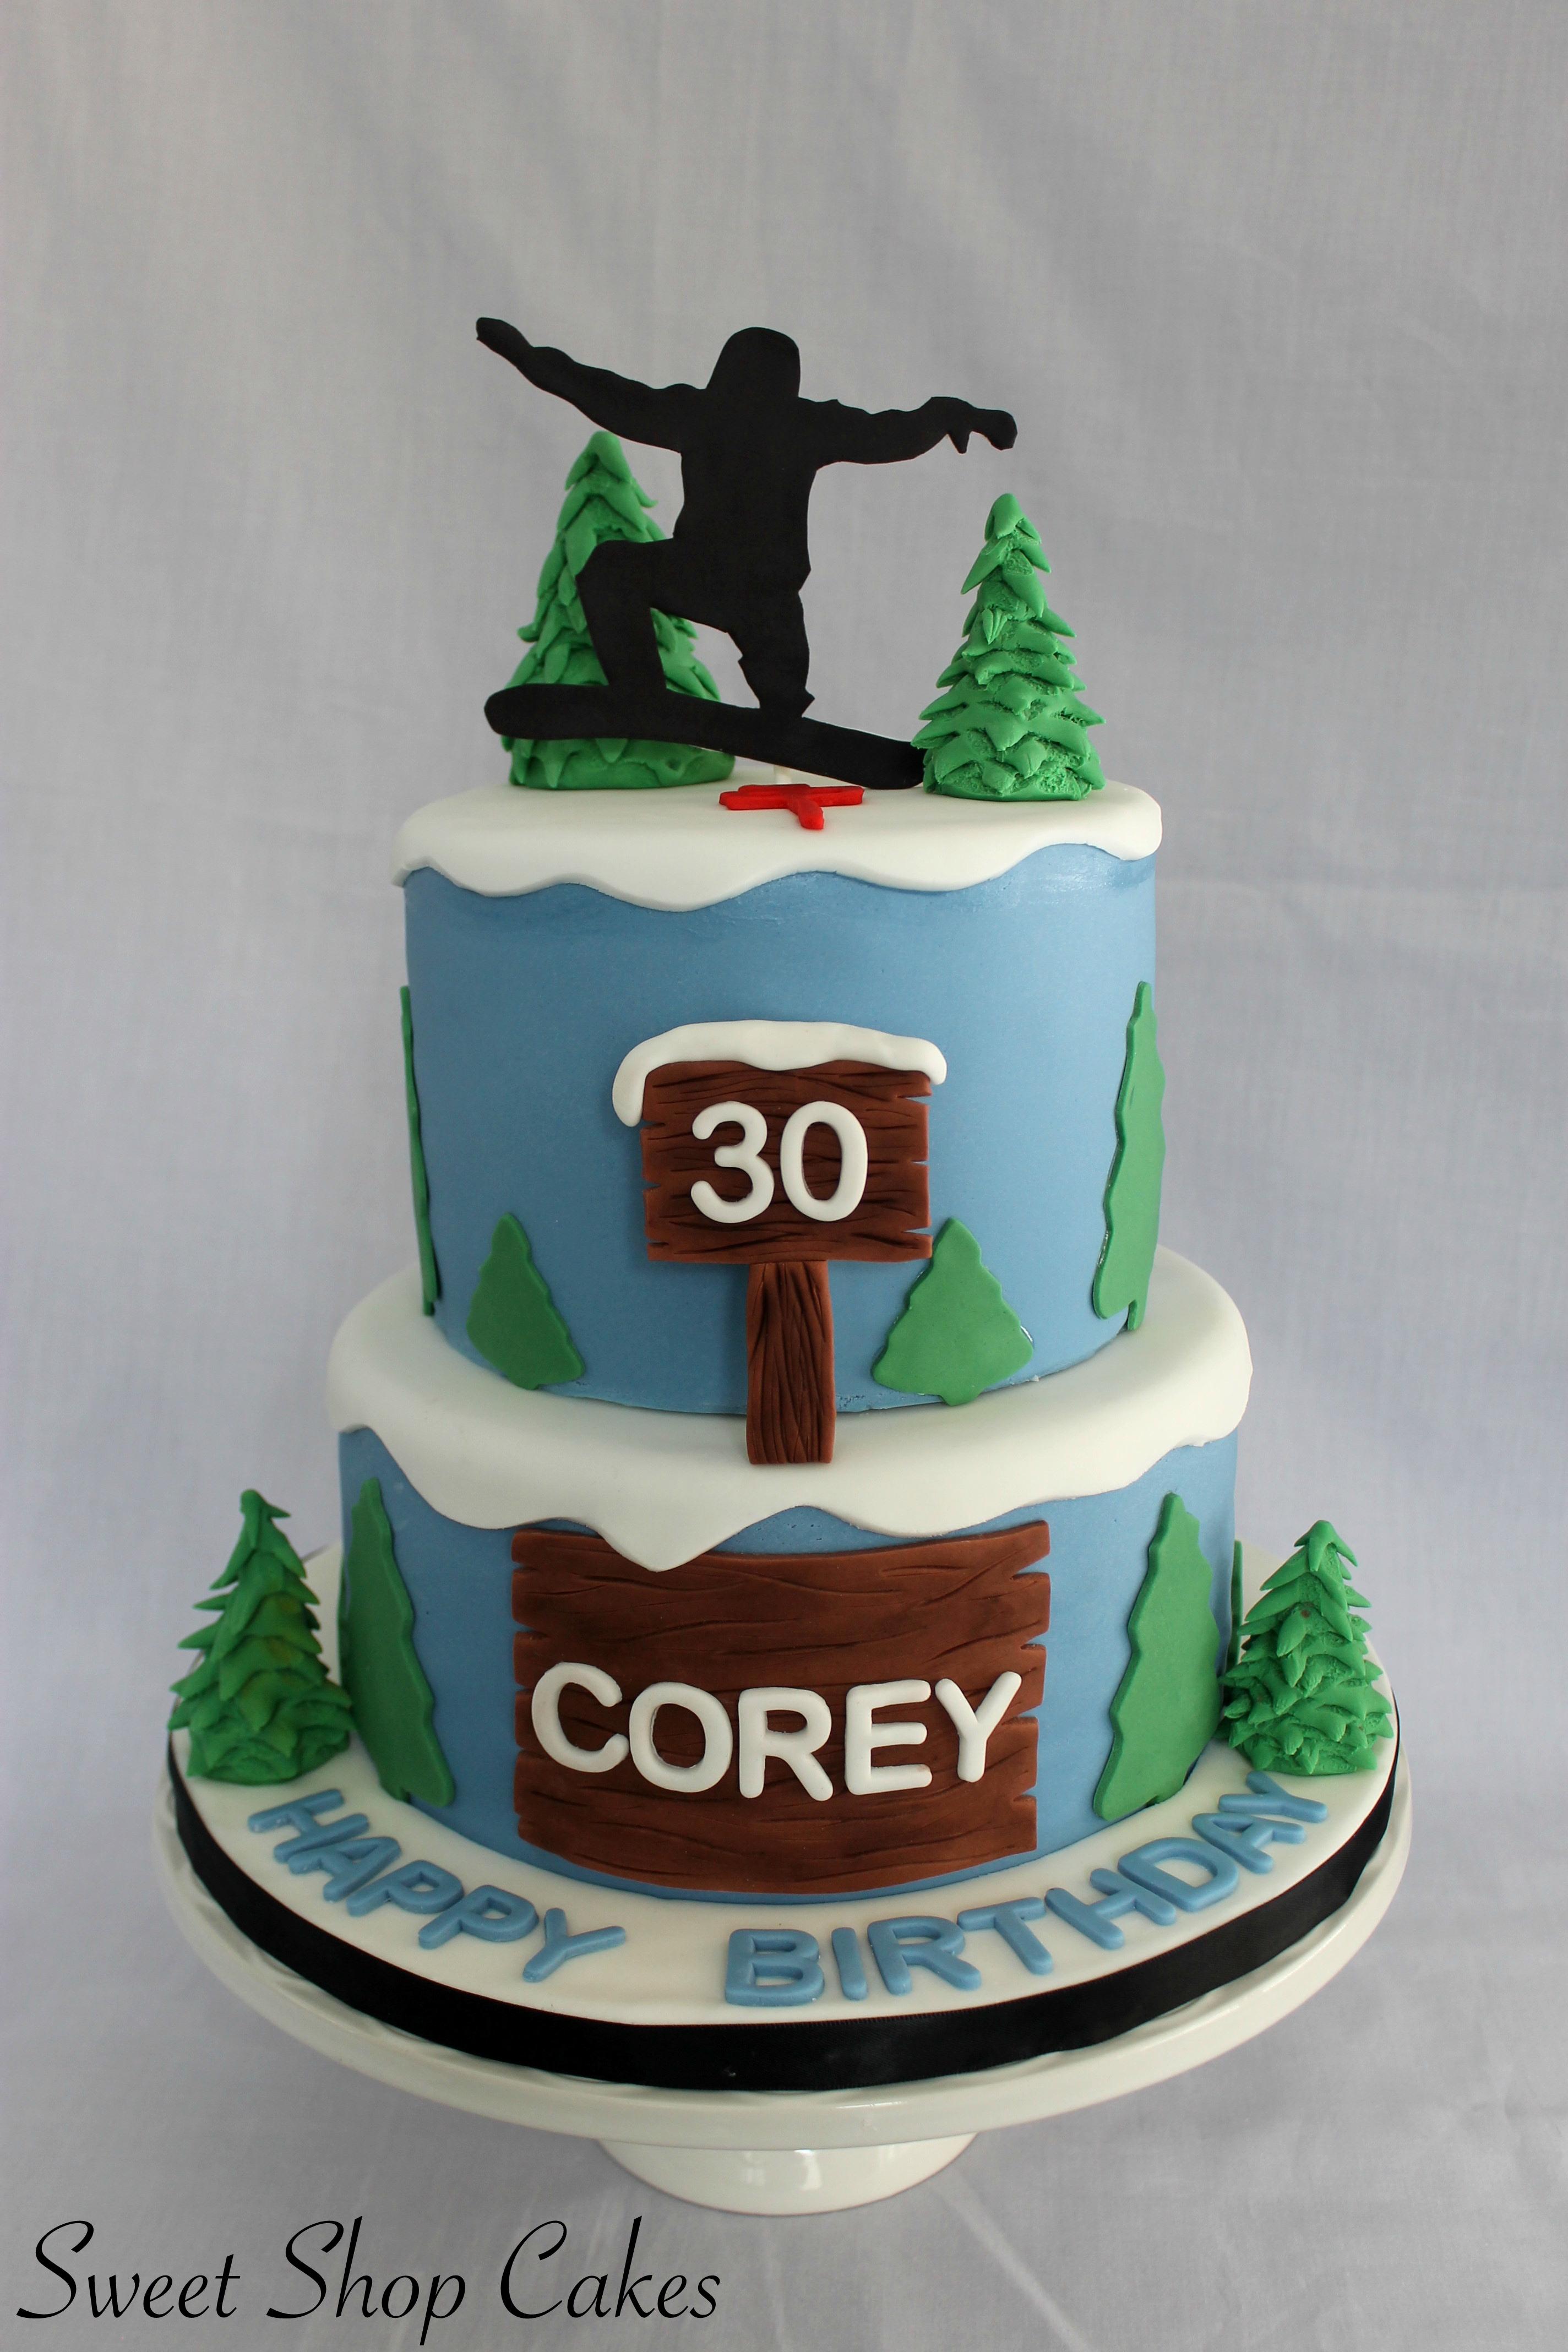 900_snowboard-themed-birthday-cake-937512AxUYg.jpg